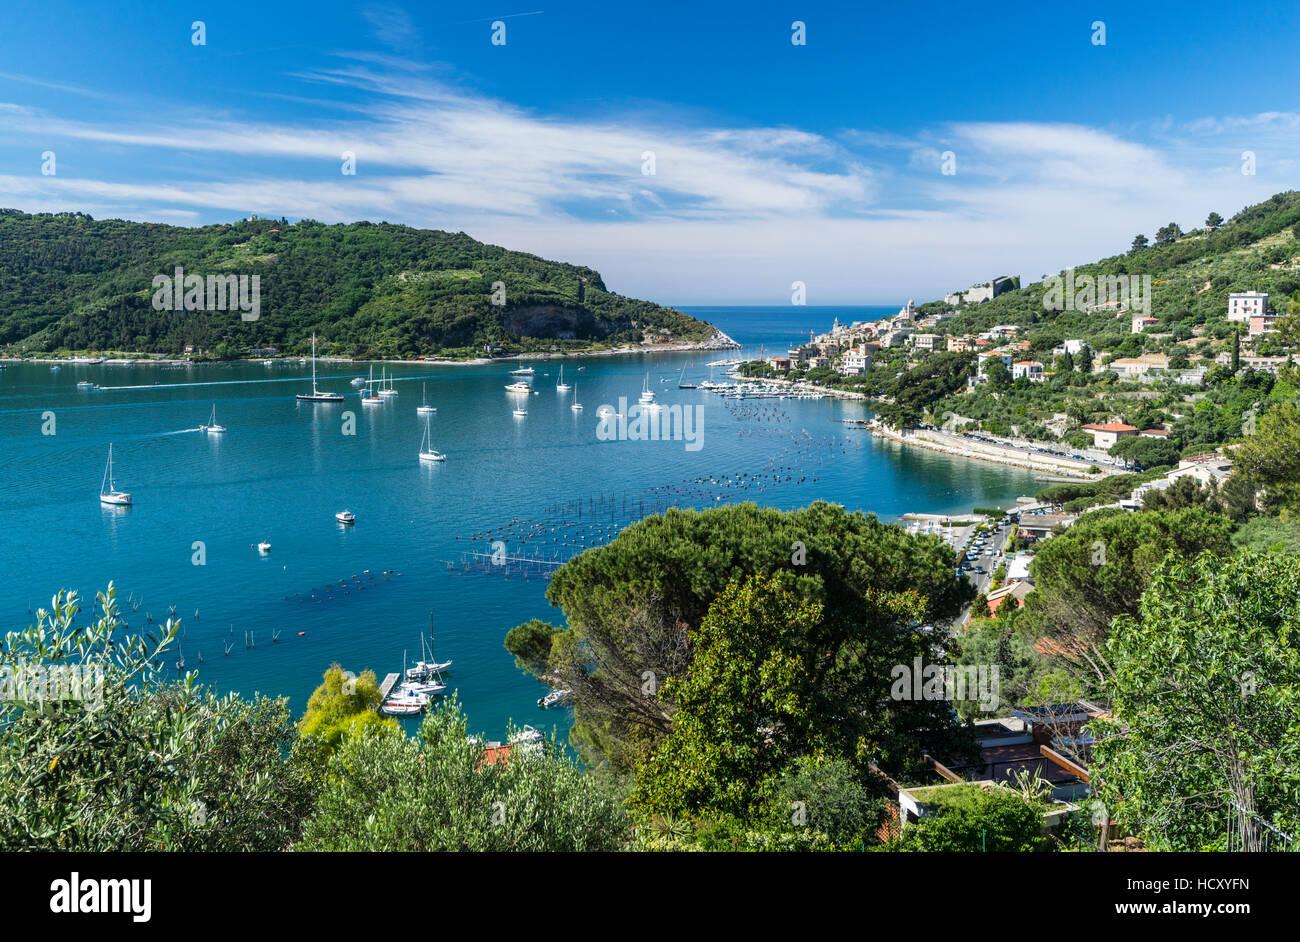 Green vegetation frames the turquoise sea of the Gulf of Poets surrounding Portovenere, La Spezia province, Liguria, - Stock Image